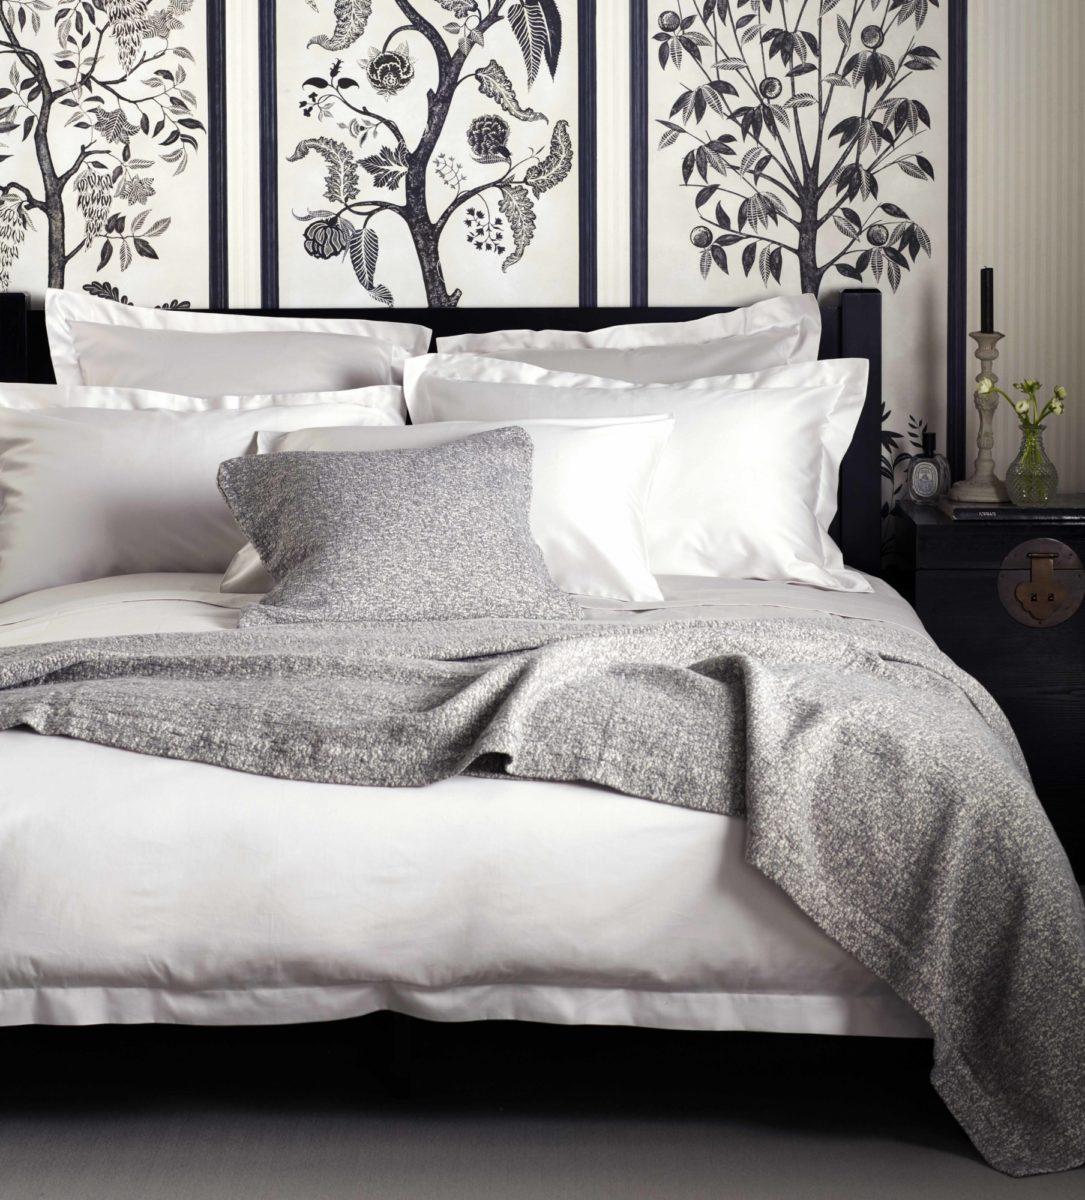 600 Thread Count Antique White Luxury Bedding Secret Linen Store